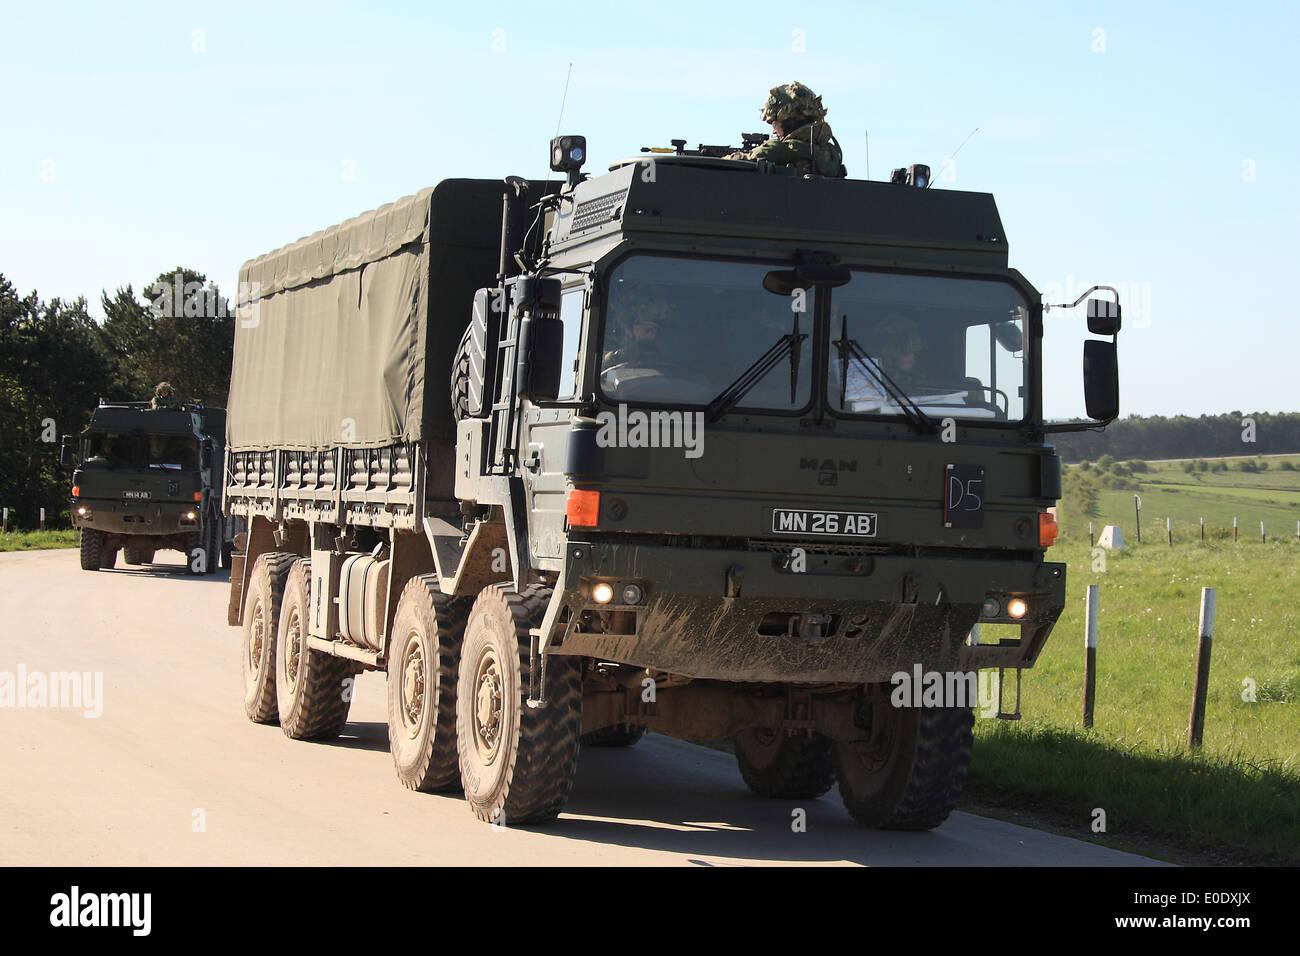 British Army MAN Cargo Truck 8x8 Stock Photo Royalty Free